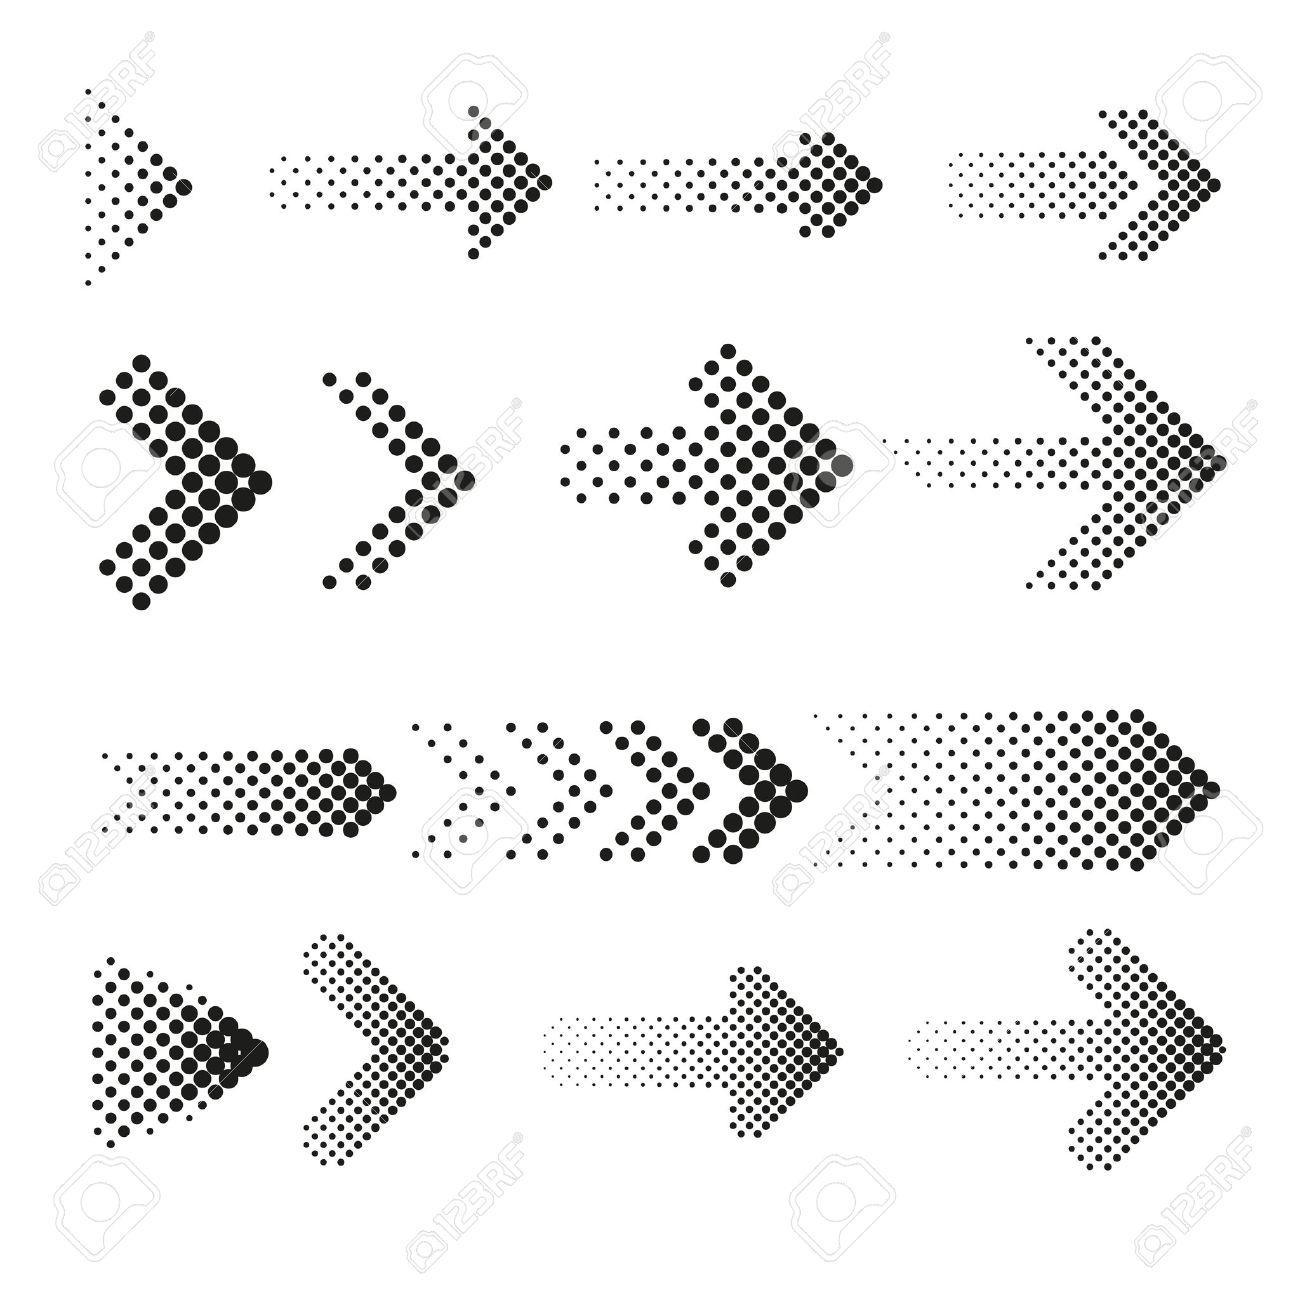 Dotted halftone arrows vector set. Arrow dot, arrow halftone, web arrow pattern illustration - 58525215